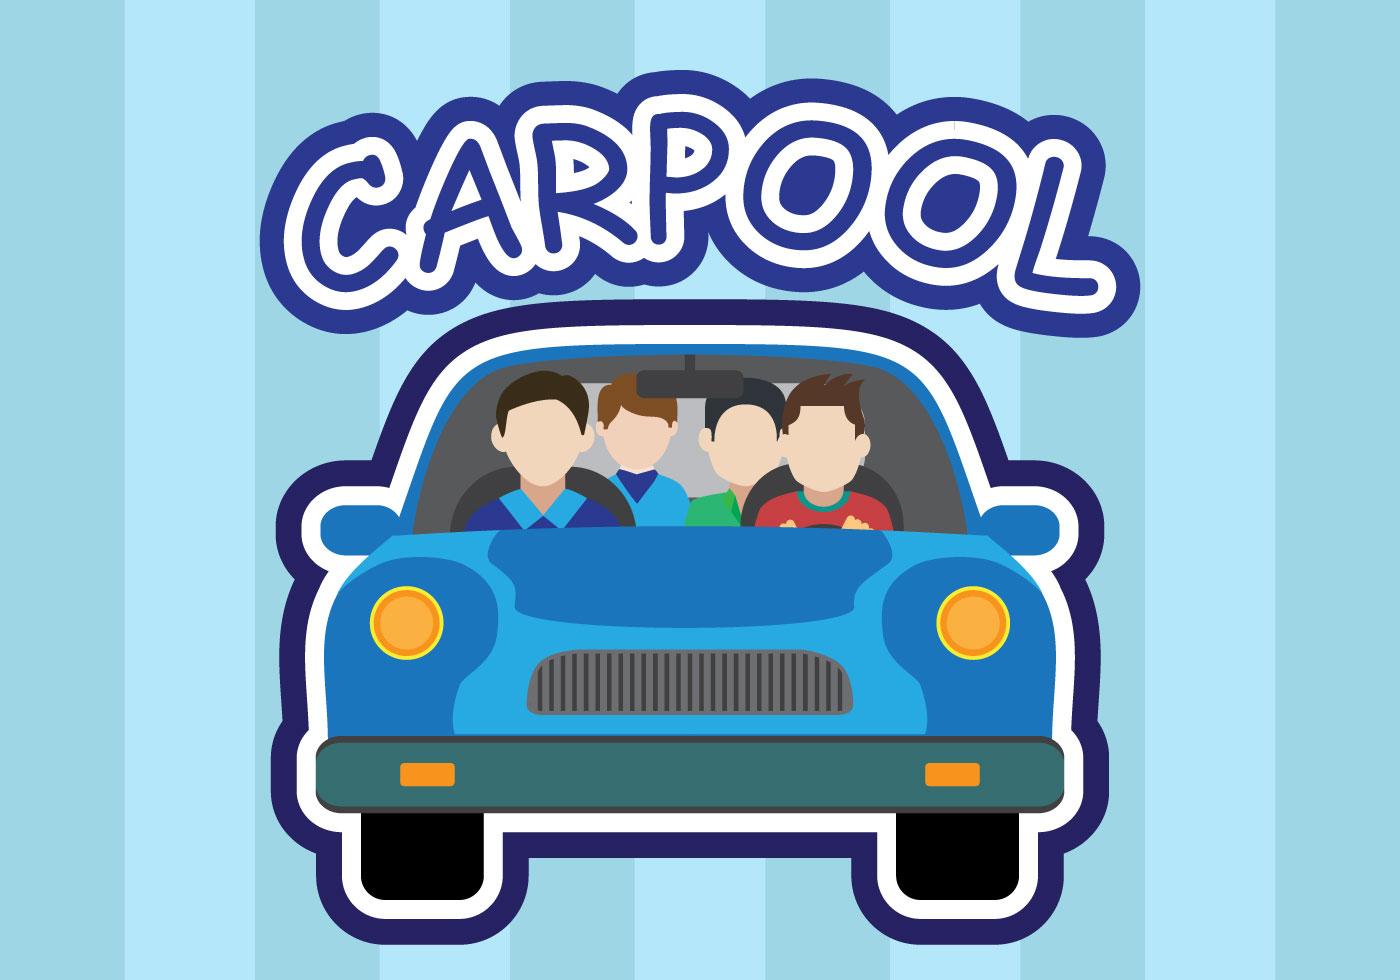 Carpool Vector Download Free Vector Art Stock Graphics Amp Images